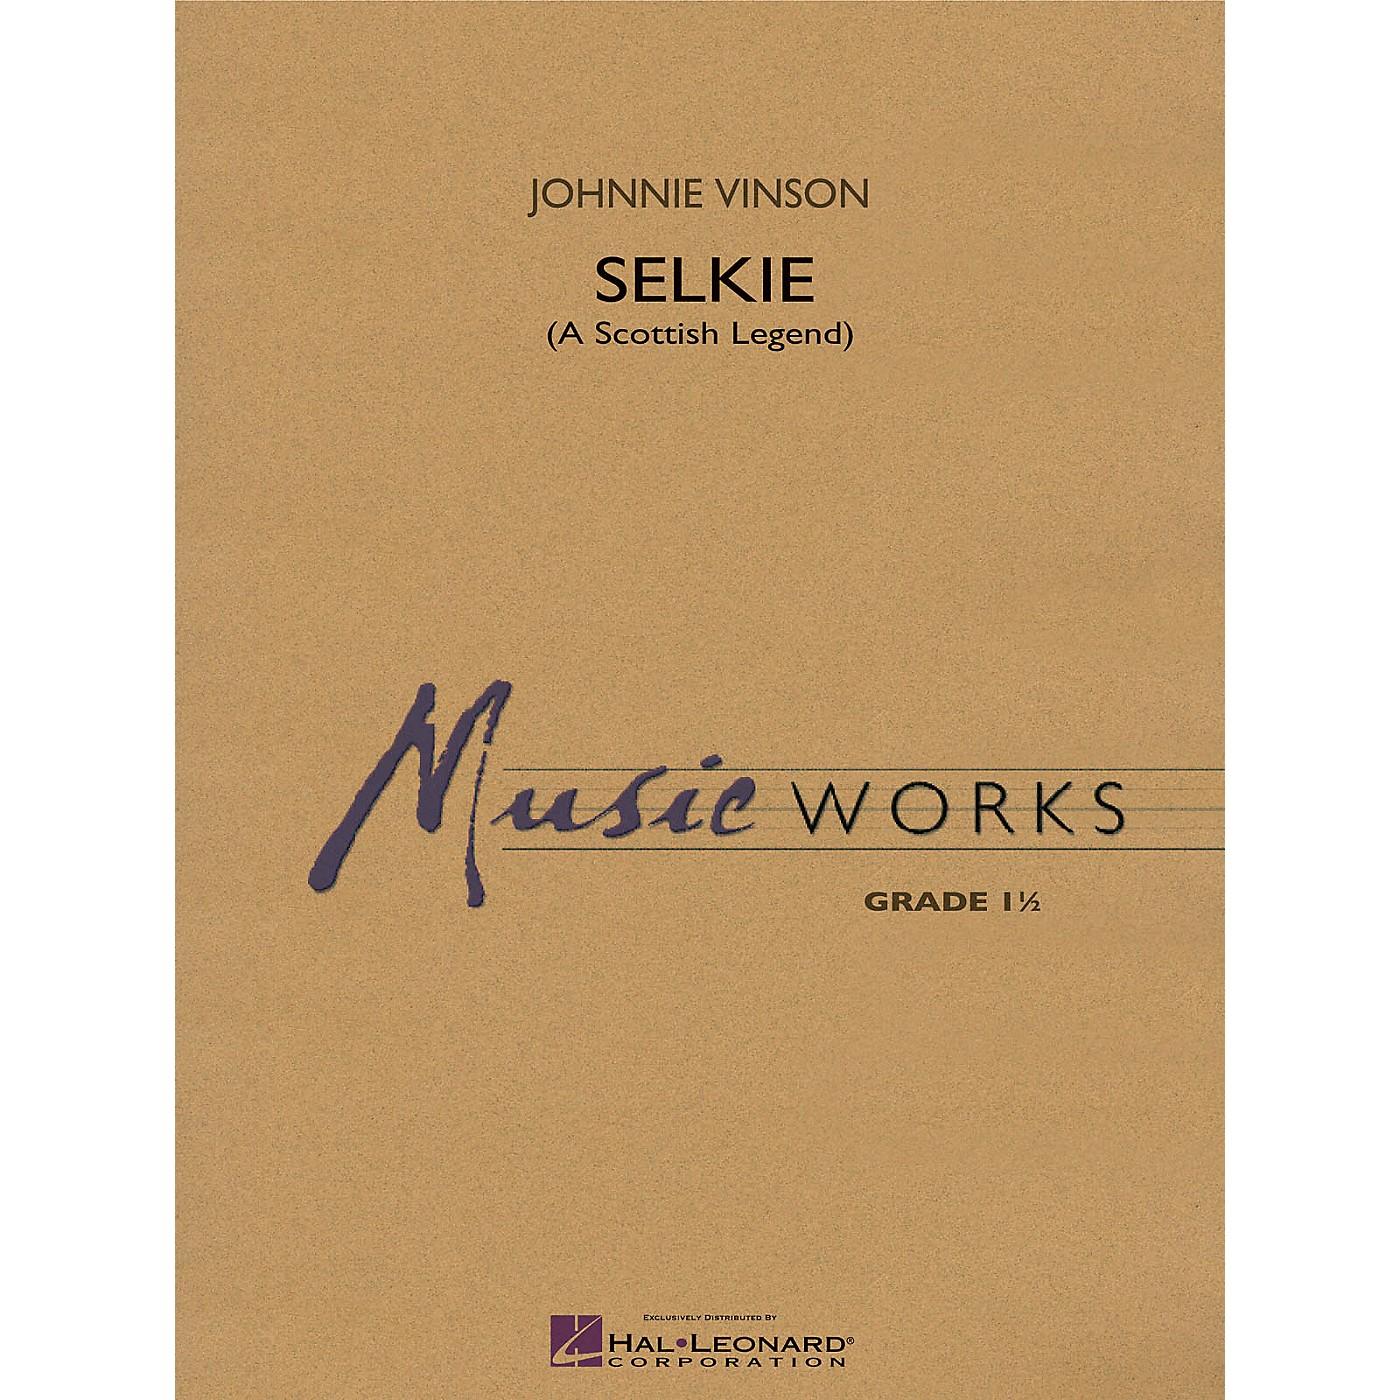 Hal Leonard Selkie (A Scottish Legend) Concert Band Level 1 Composed by Johnnie Vinson thumbnail